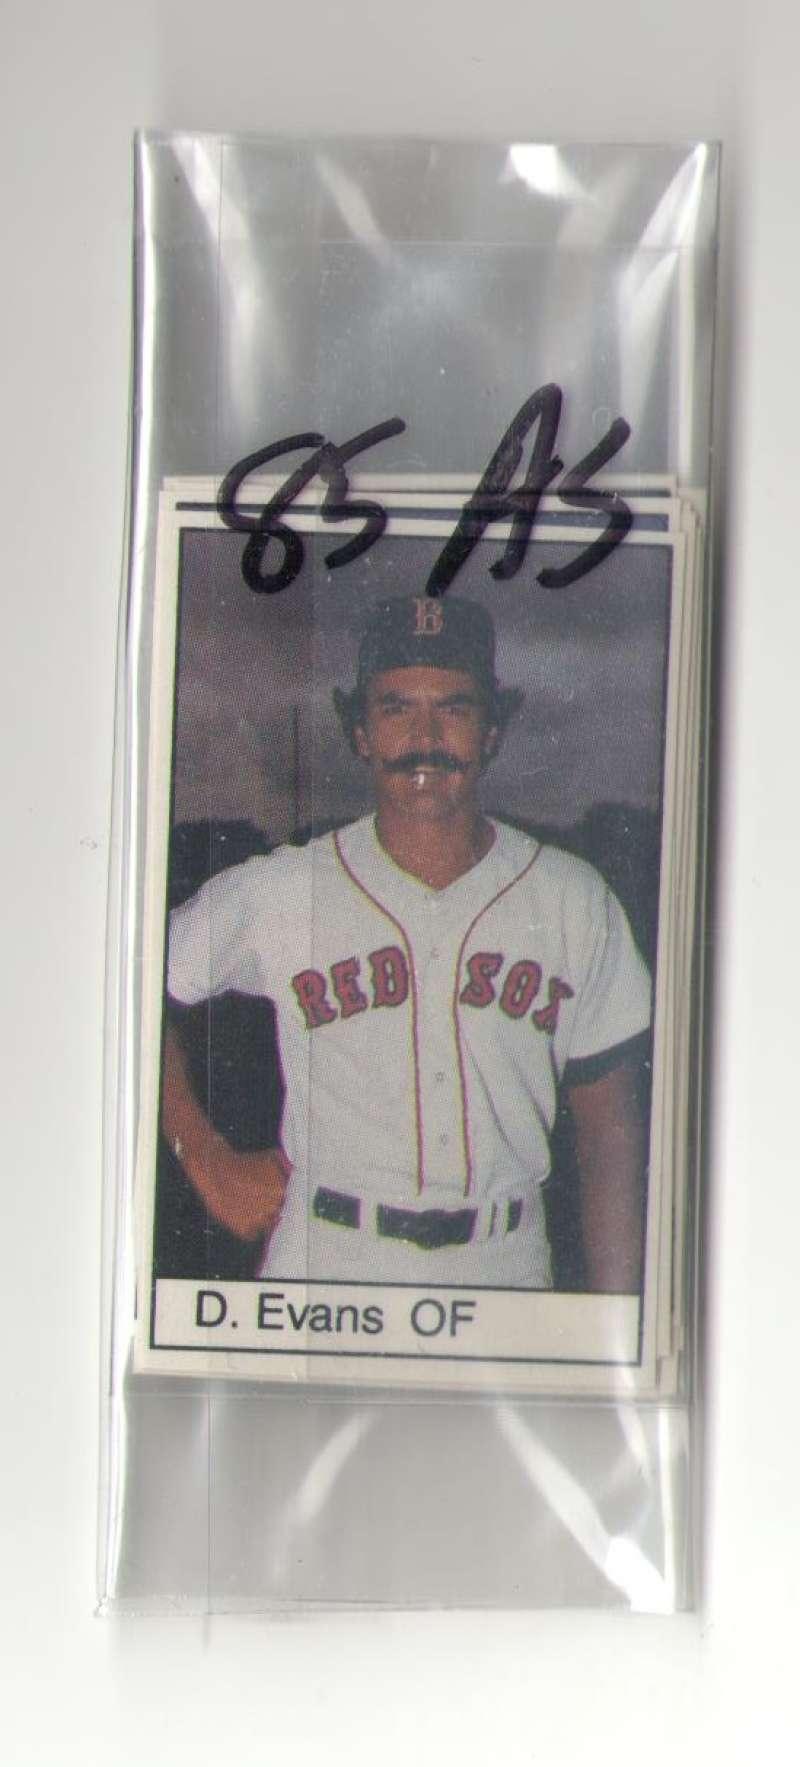 1985 All-Star Game Program Inserts BOSTON RED SOX Team Set